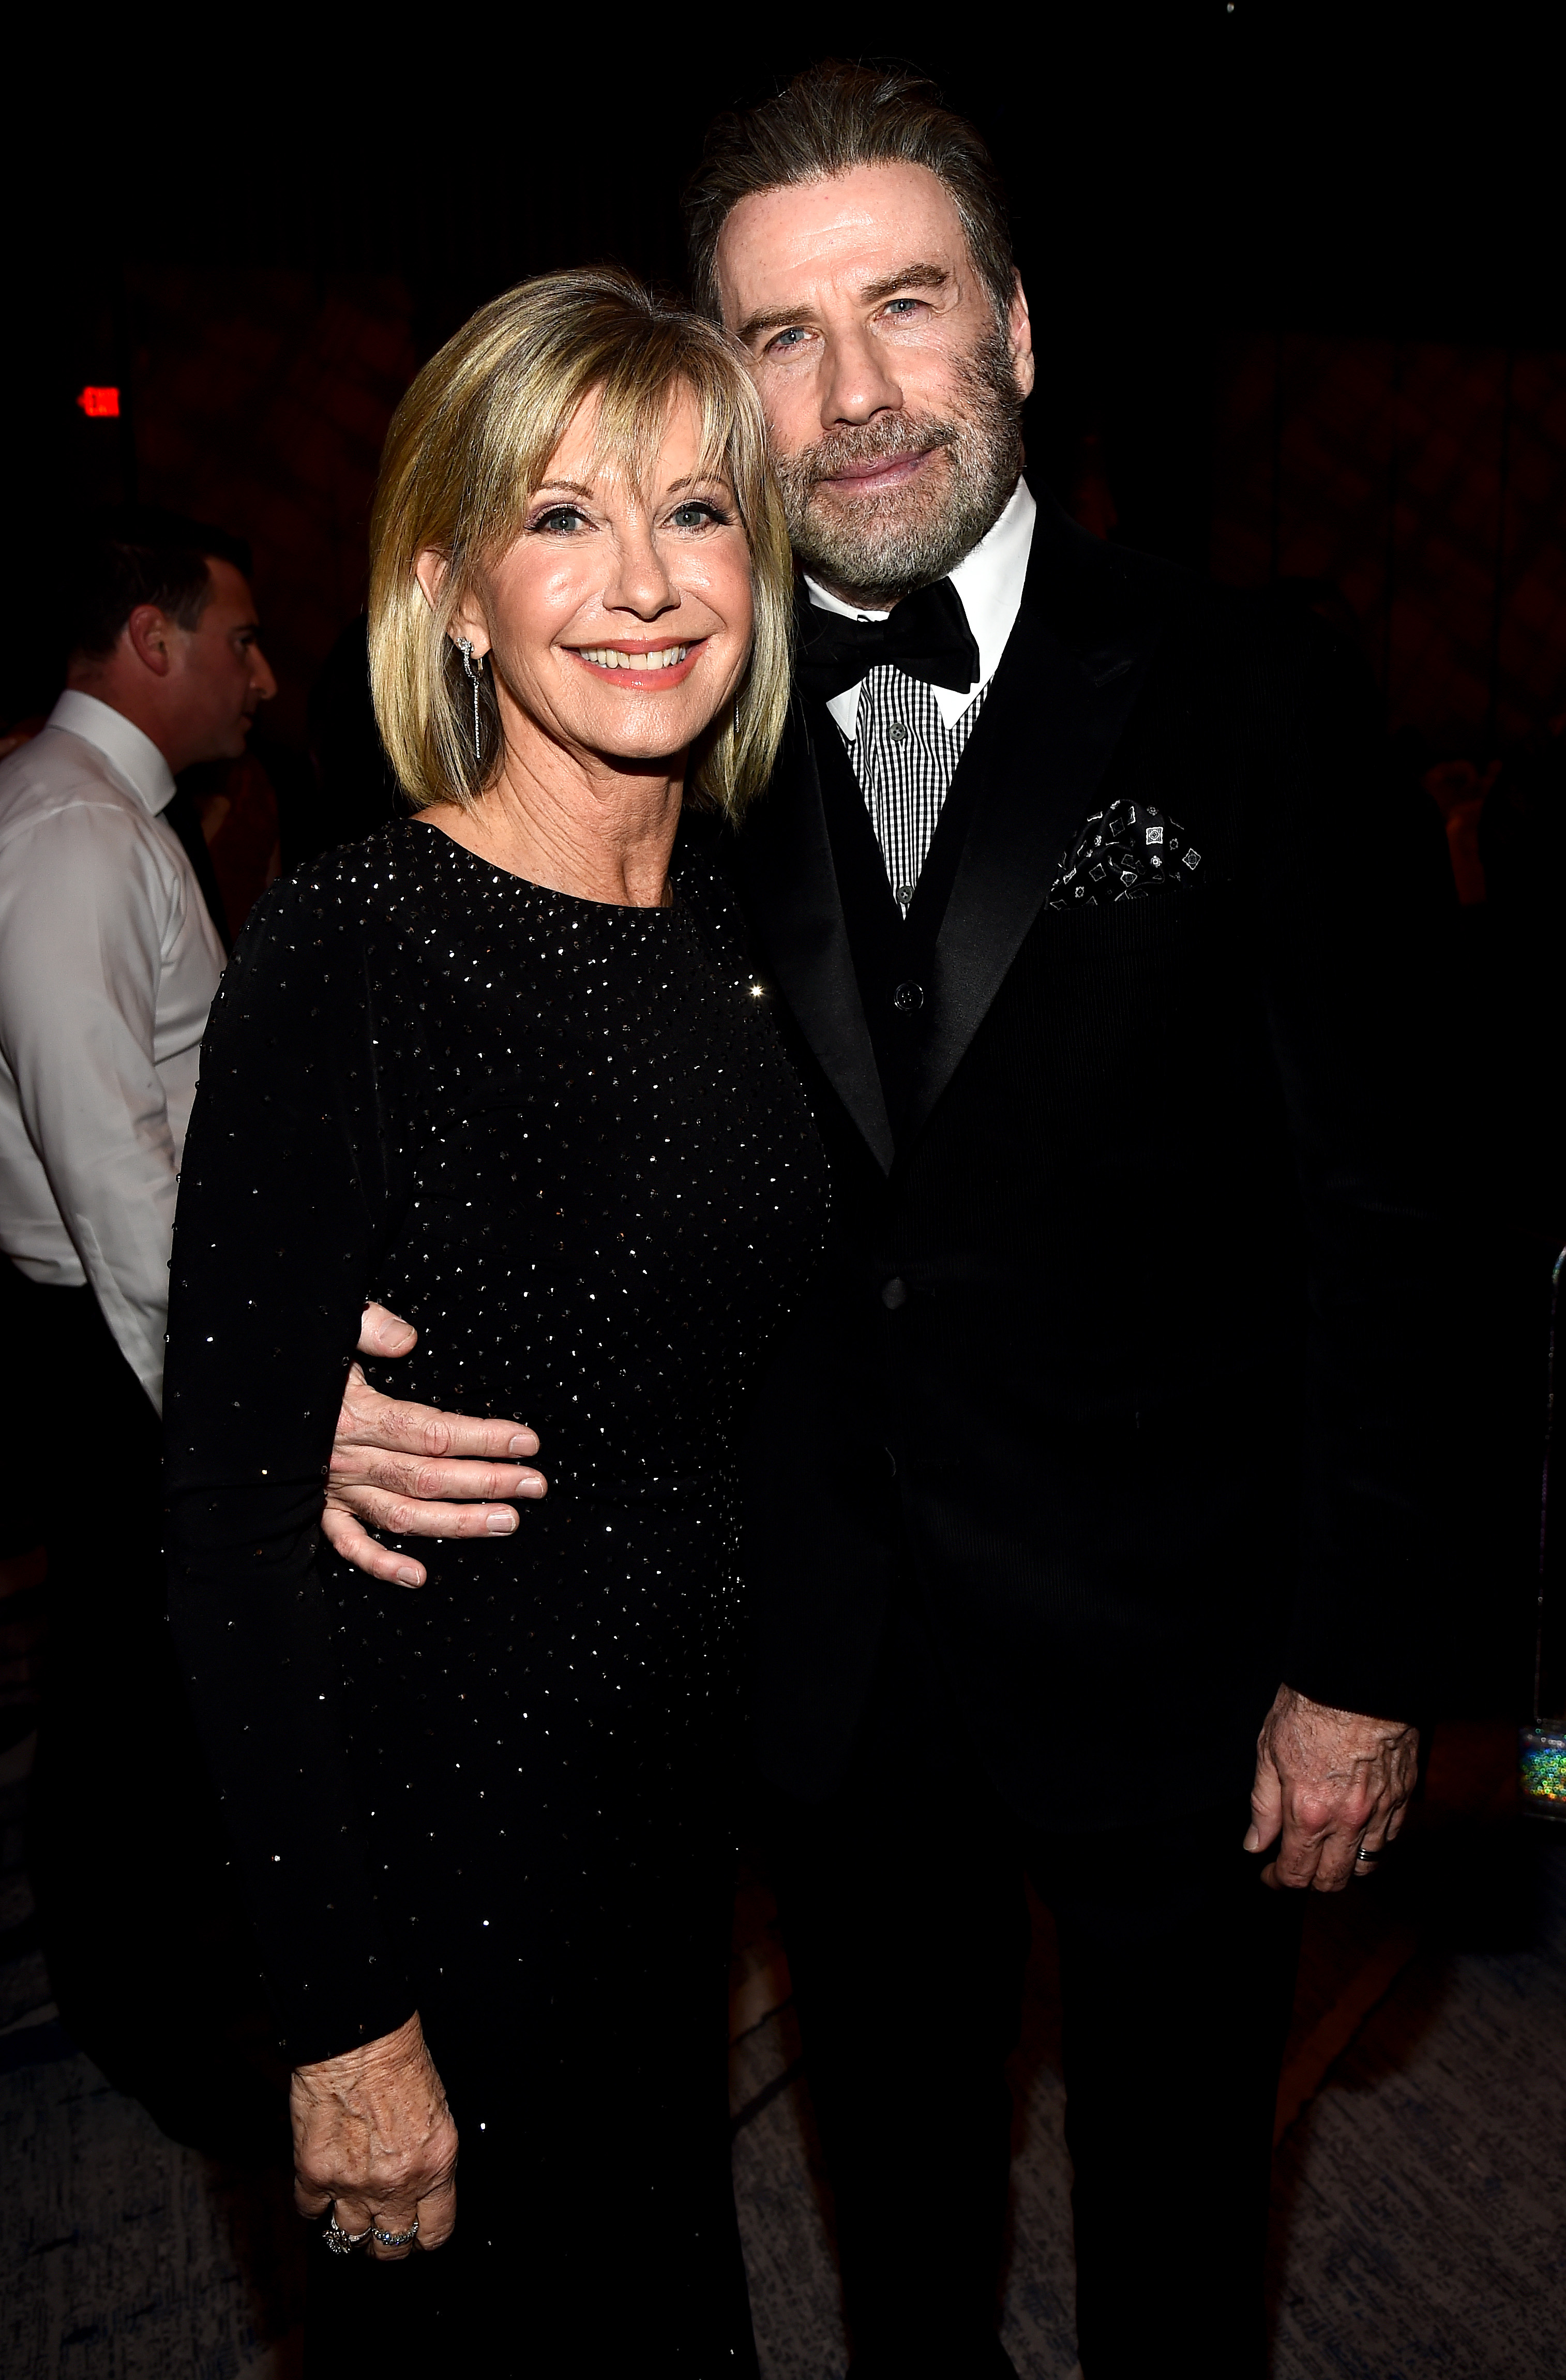 Olivia Newton-John Recalls How 'Nurturing and Sweet' John Travolta Was on 'Grease'